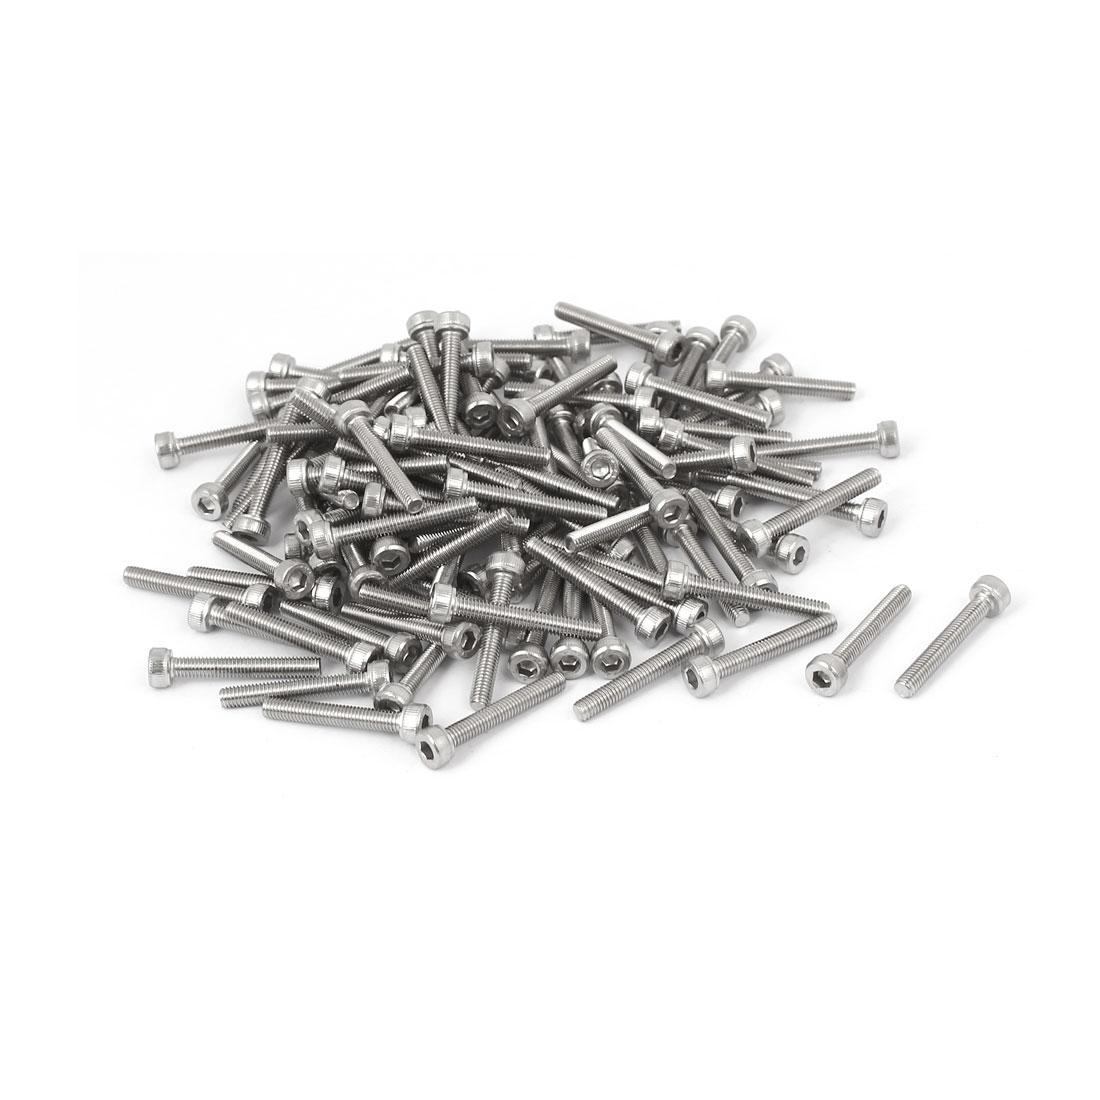 M3x20mm Thread 304 Stainless Steel Hex Socket Head Cap Screw Bolt DIN912 120pcs